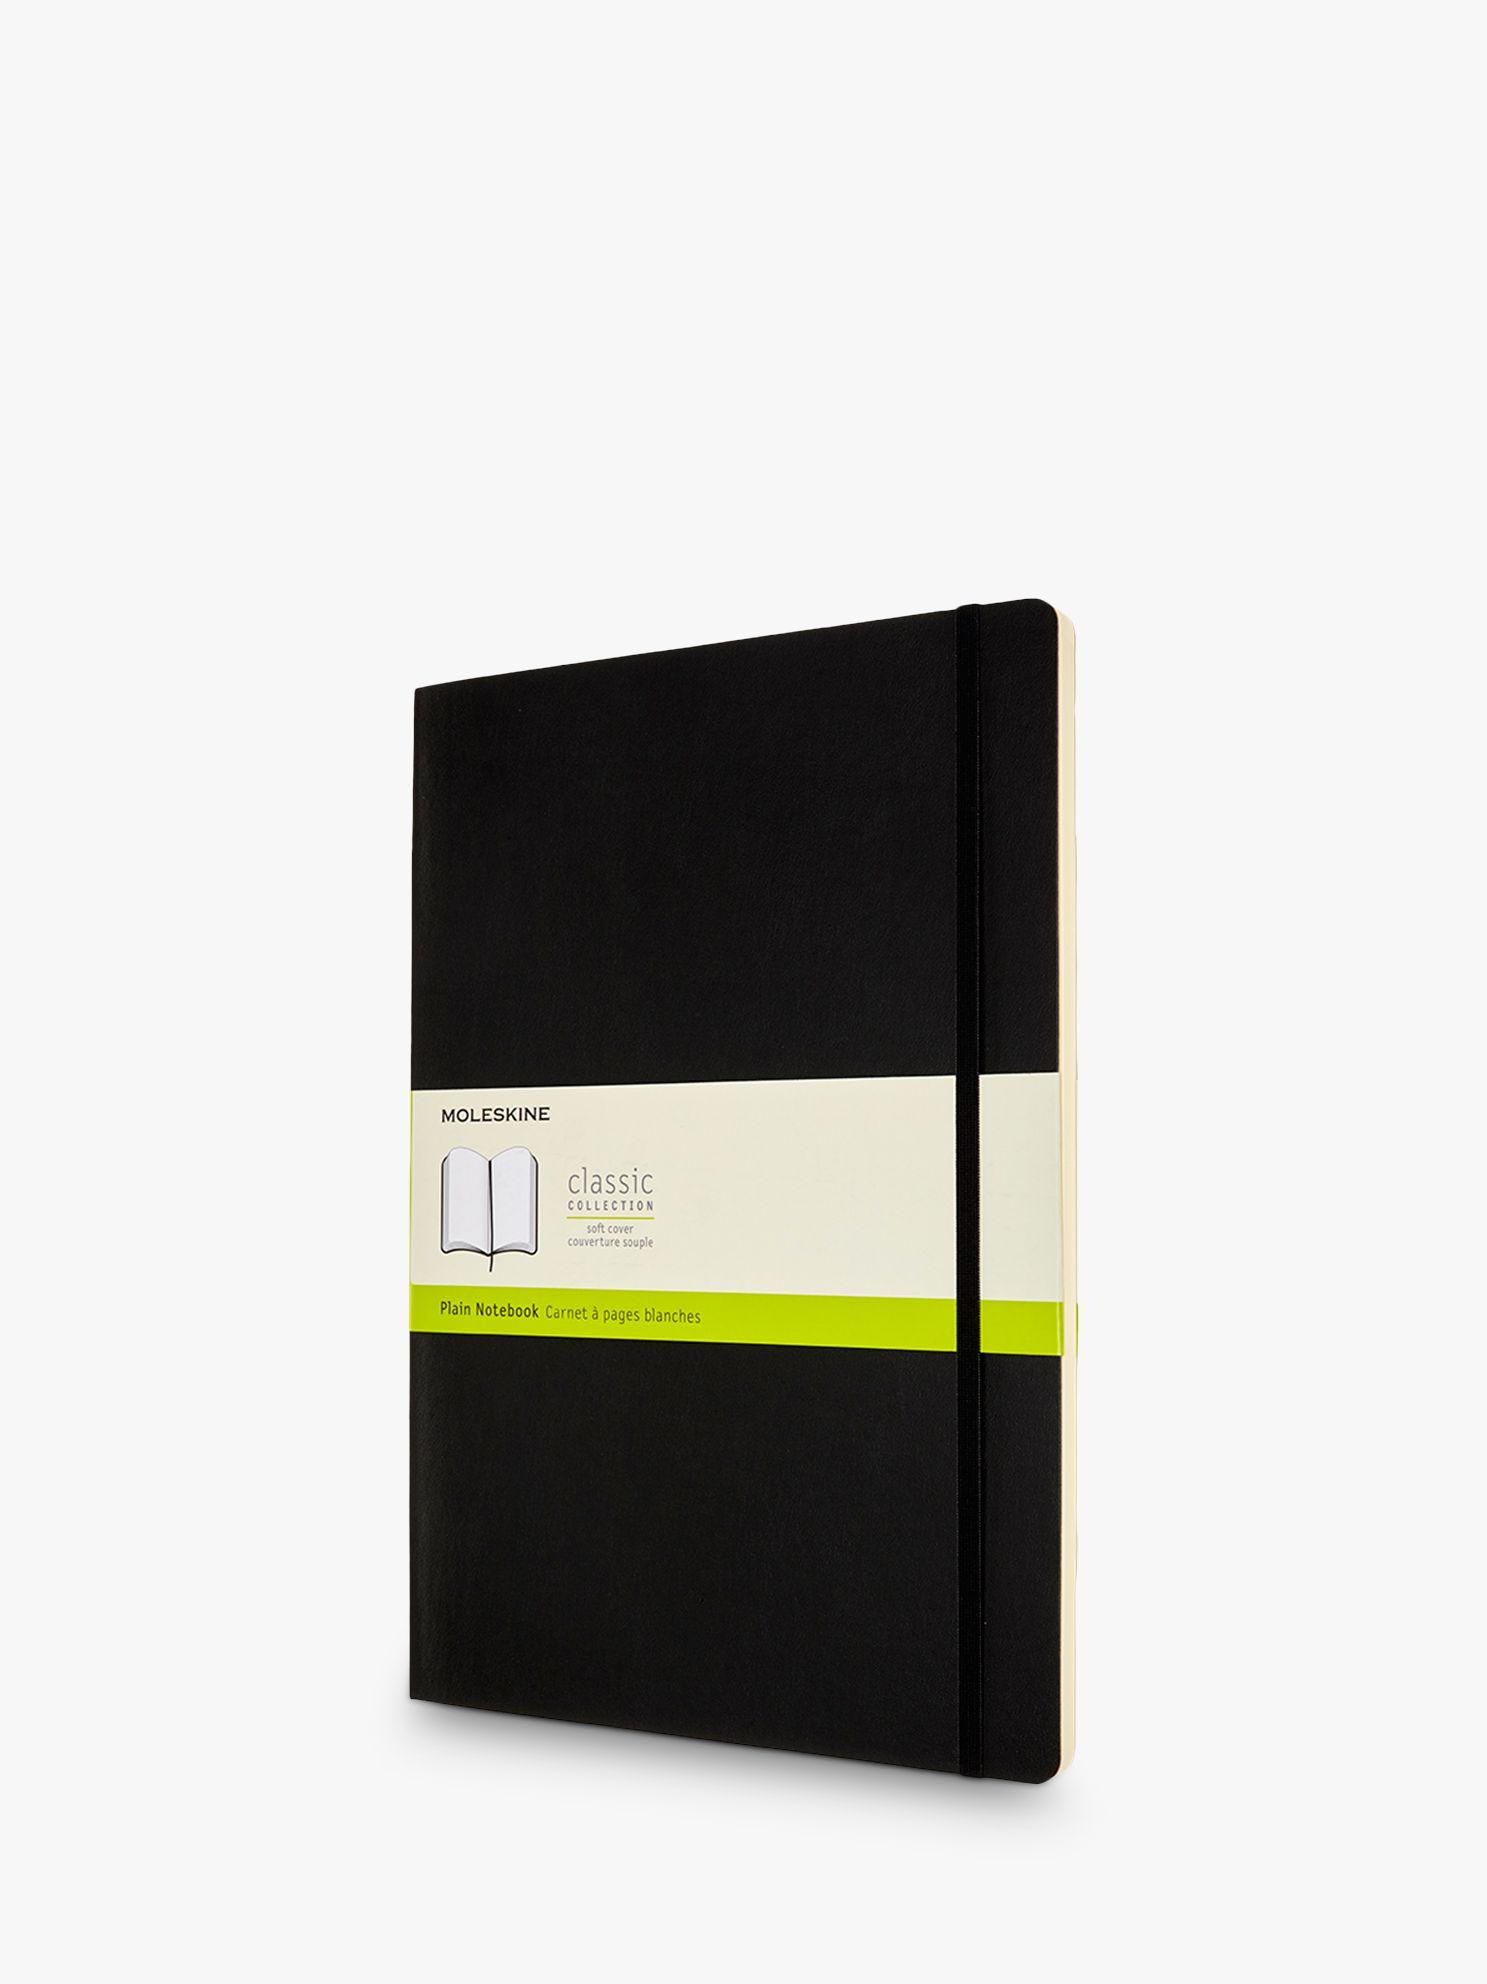 Moleskine Moleskine A4 Plain Soft Cover Notebook, Black